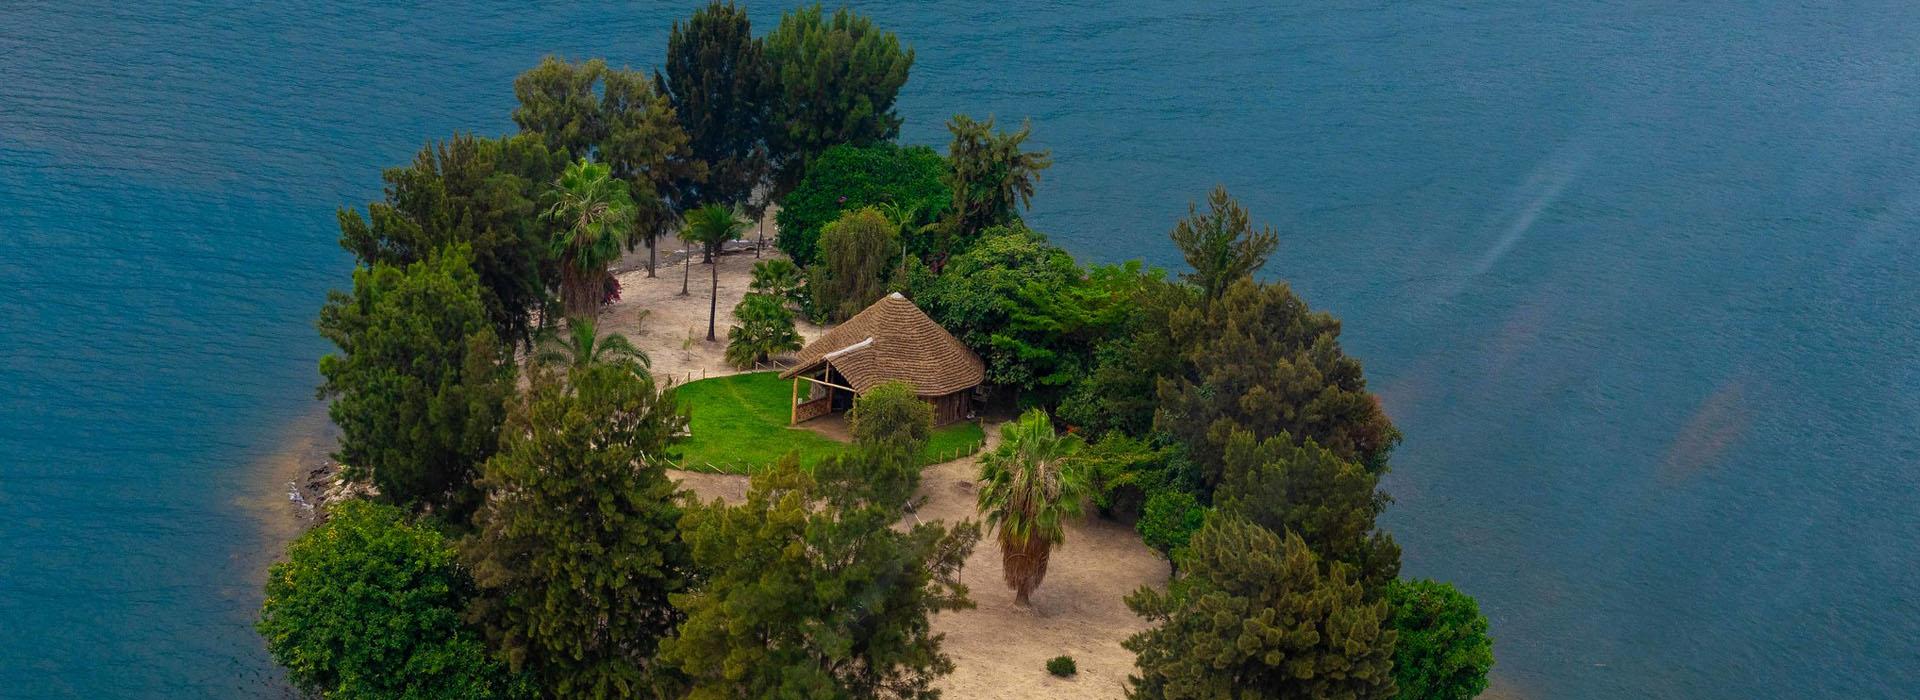 African Adventure Specialists - Lake Kivu Destination